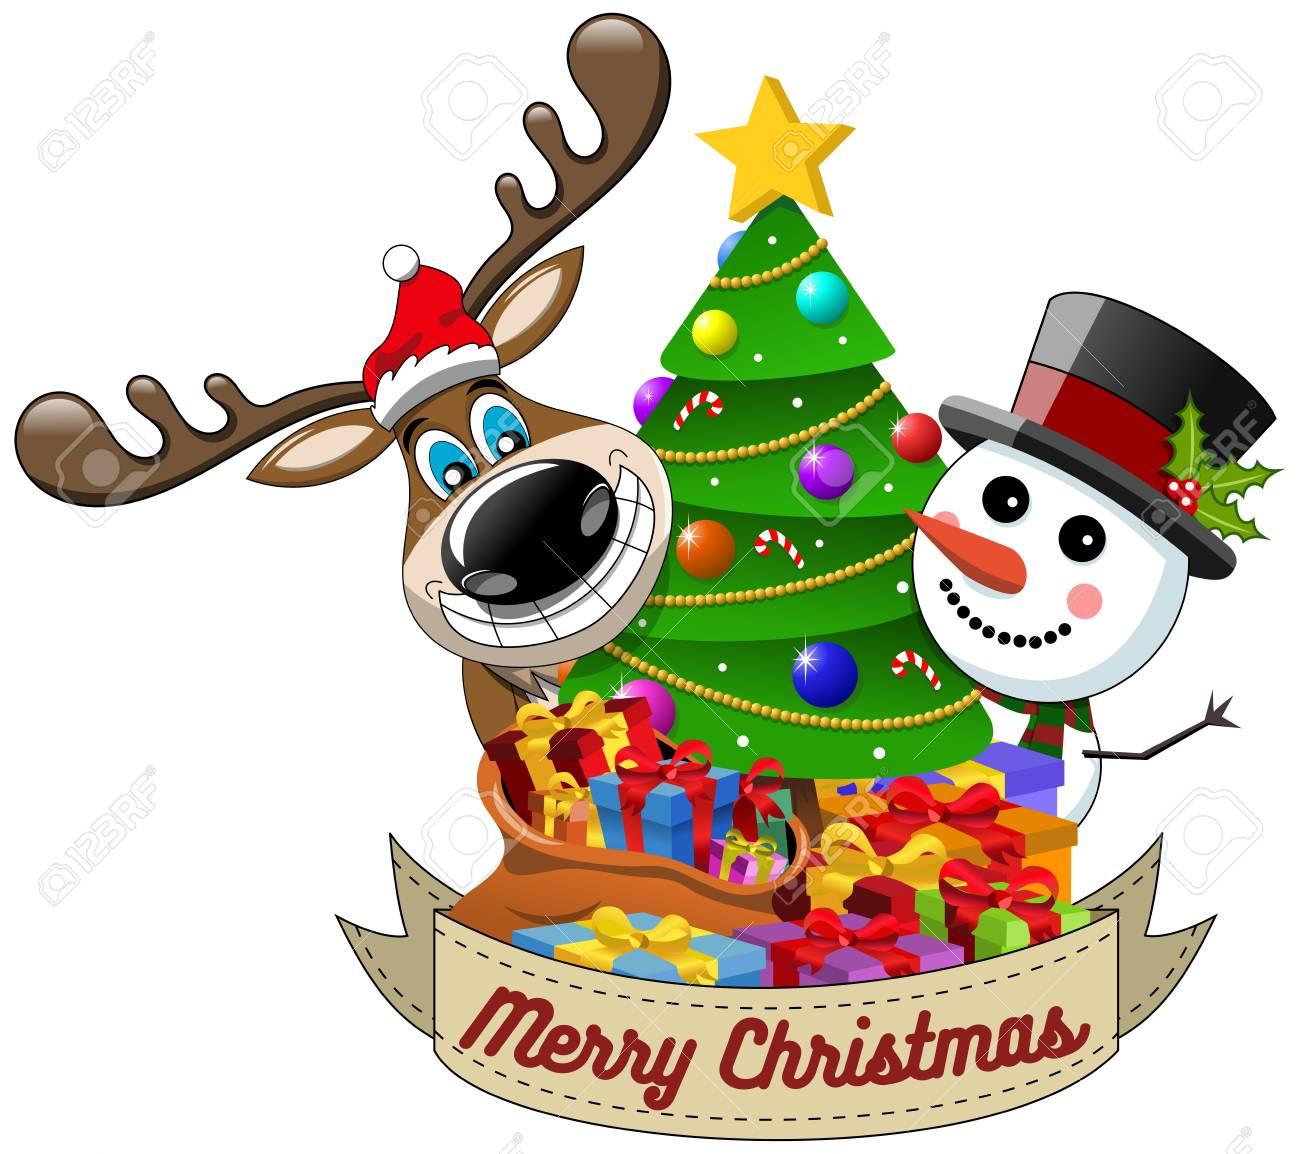 Cartoon Funny Reindeer And Snowman Wishing Merry Christmas Behind ...